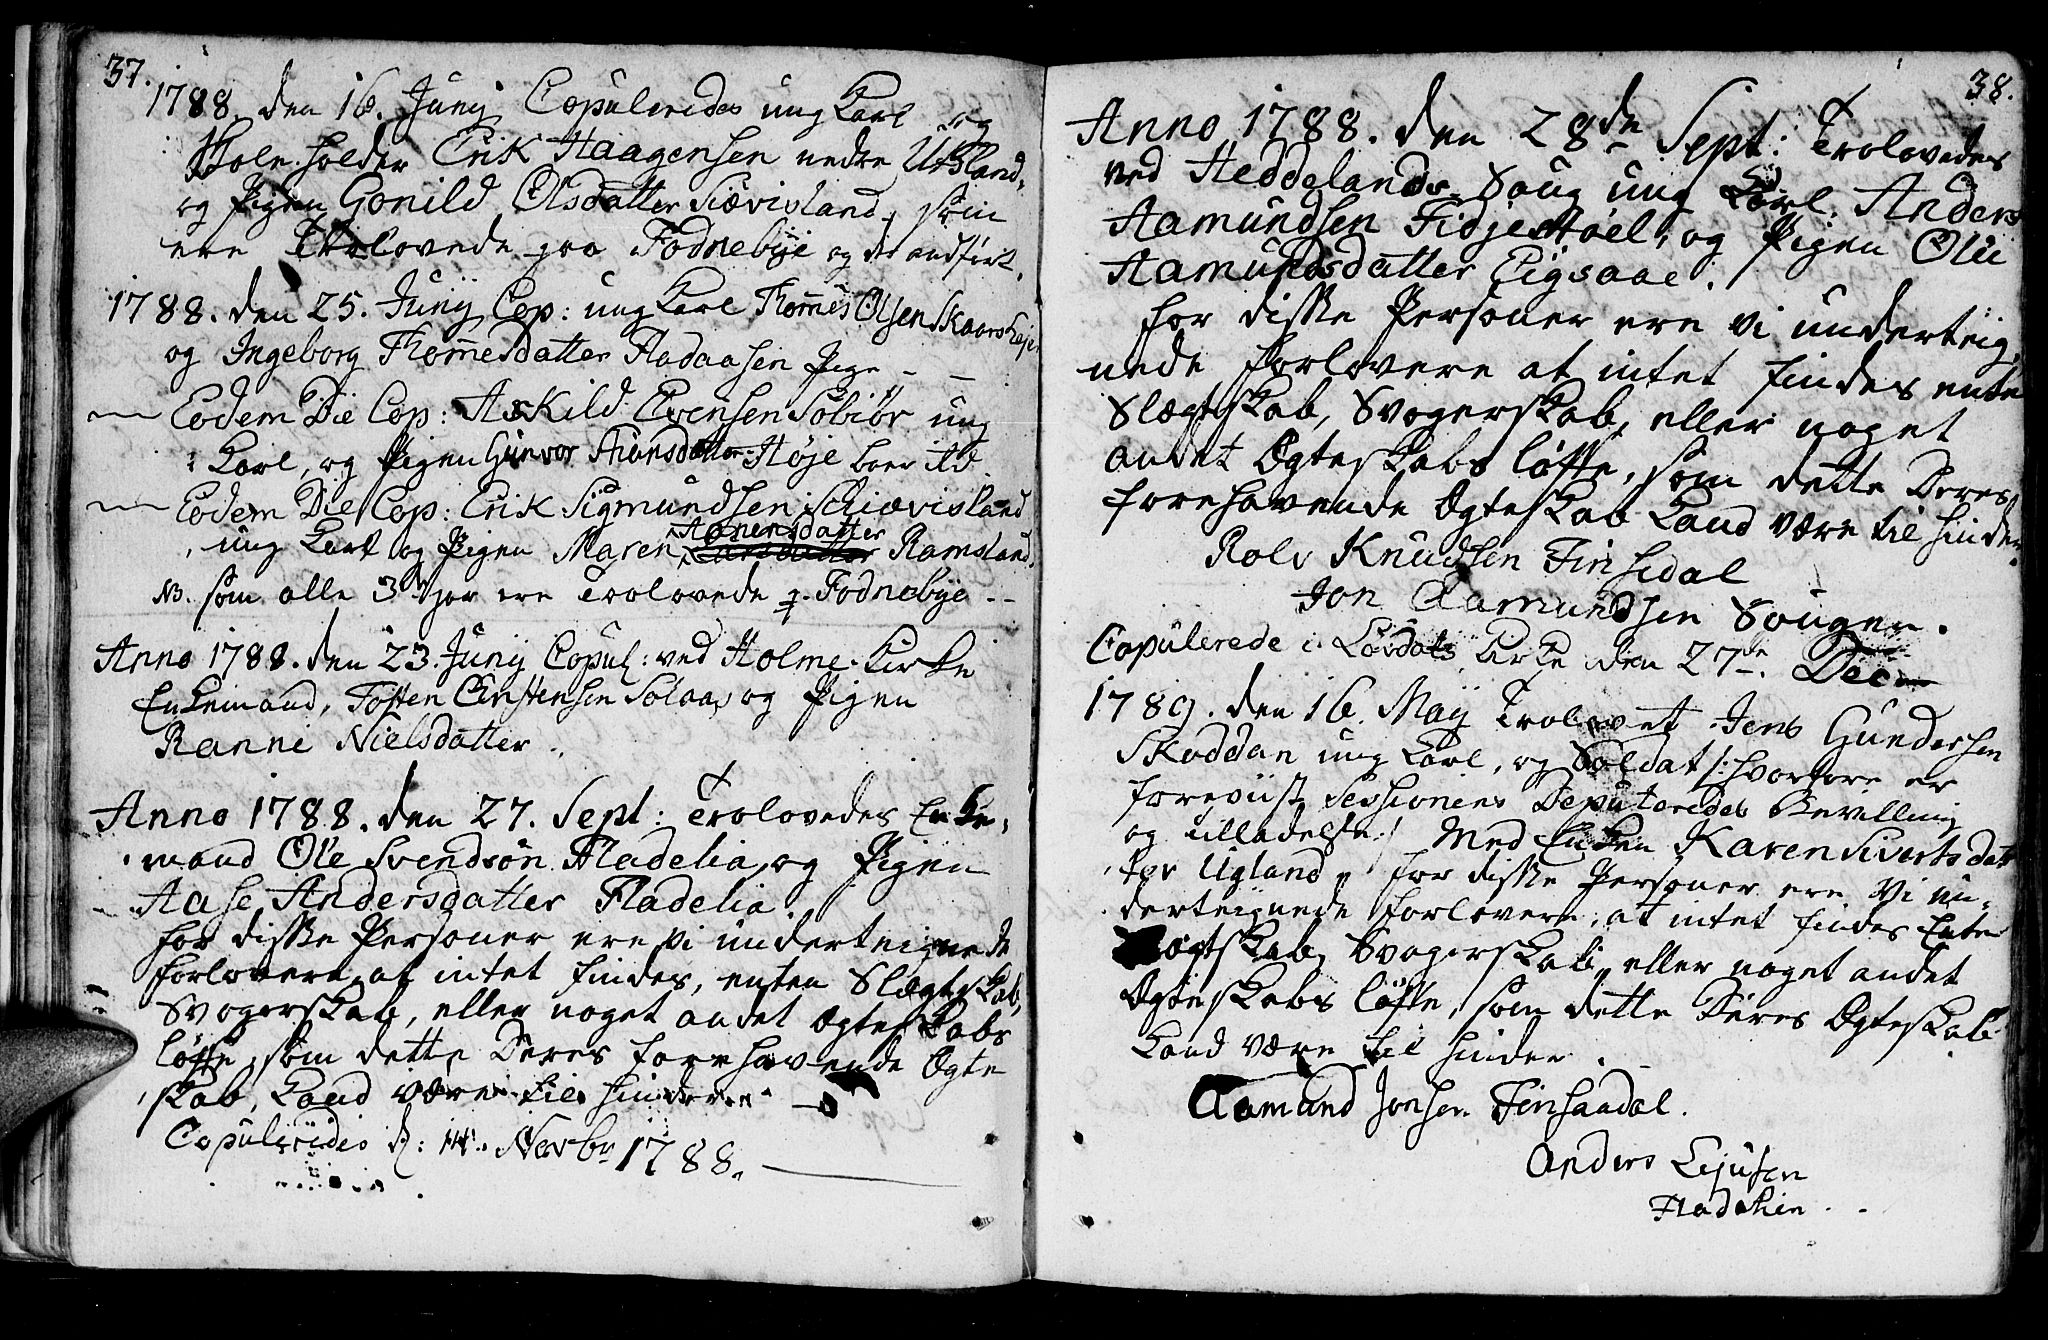 SAK, Holum sokneprestkontor, F/Fa/Fac/L0001: Ministerialbok nr. A 1, 1773-1820, s. 37-38